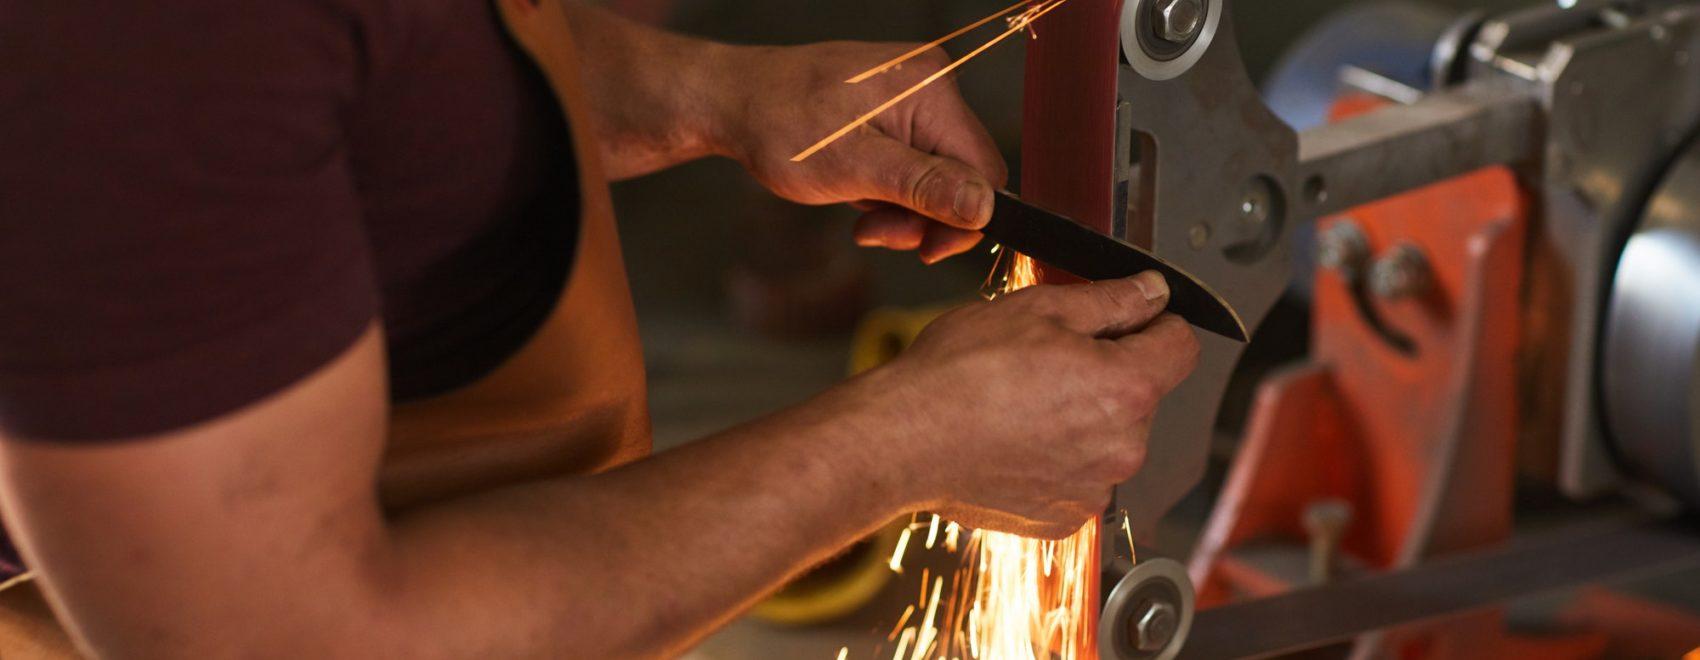 Using knife grinding jig